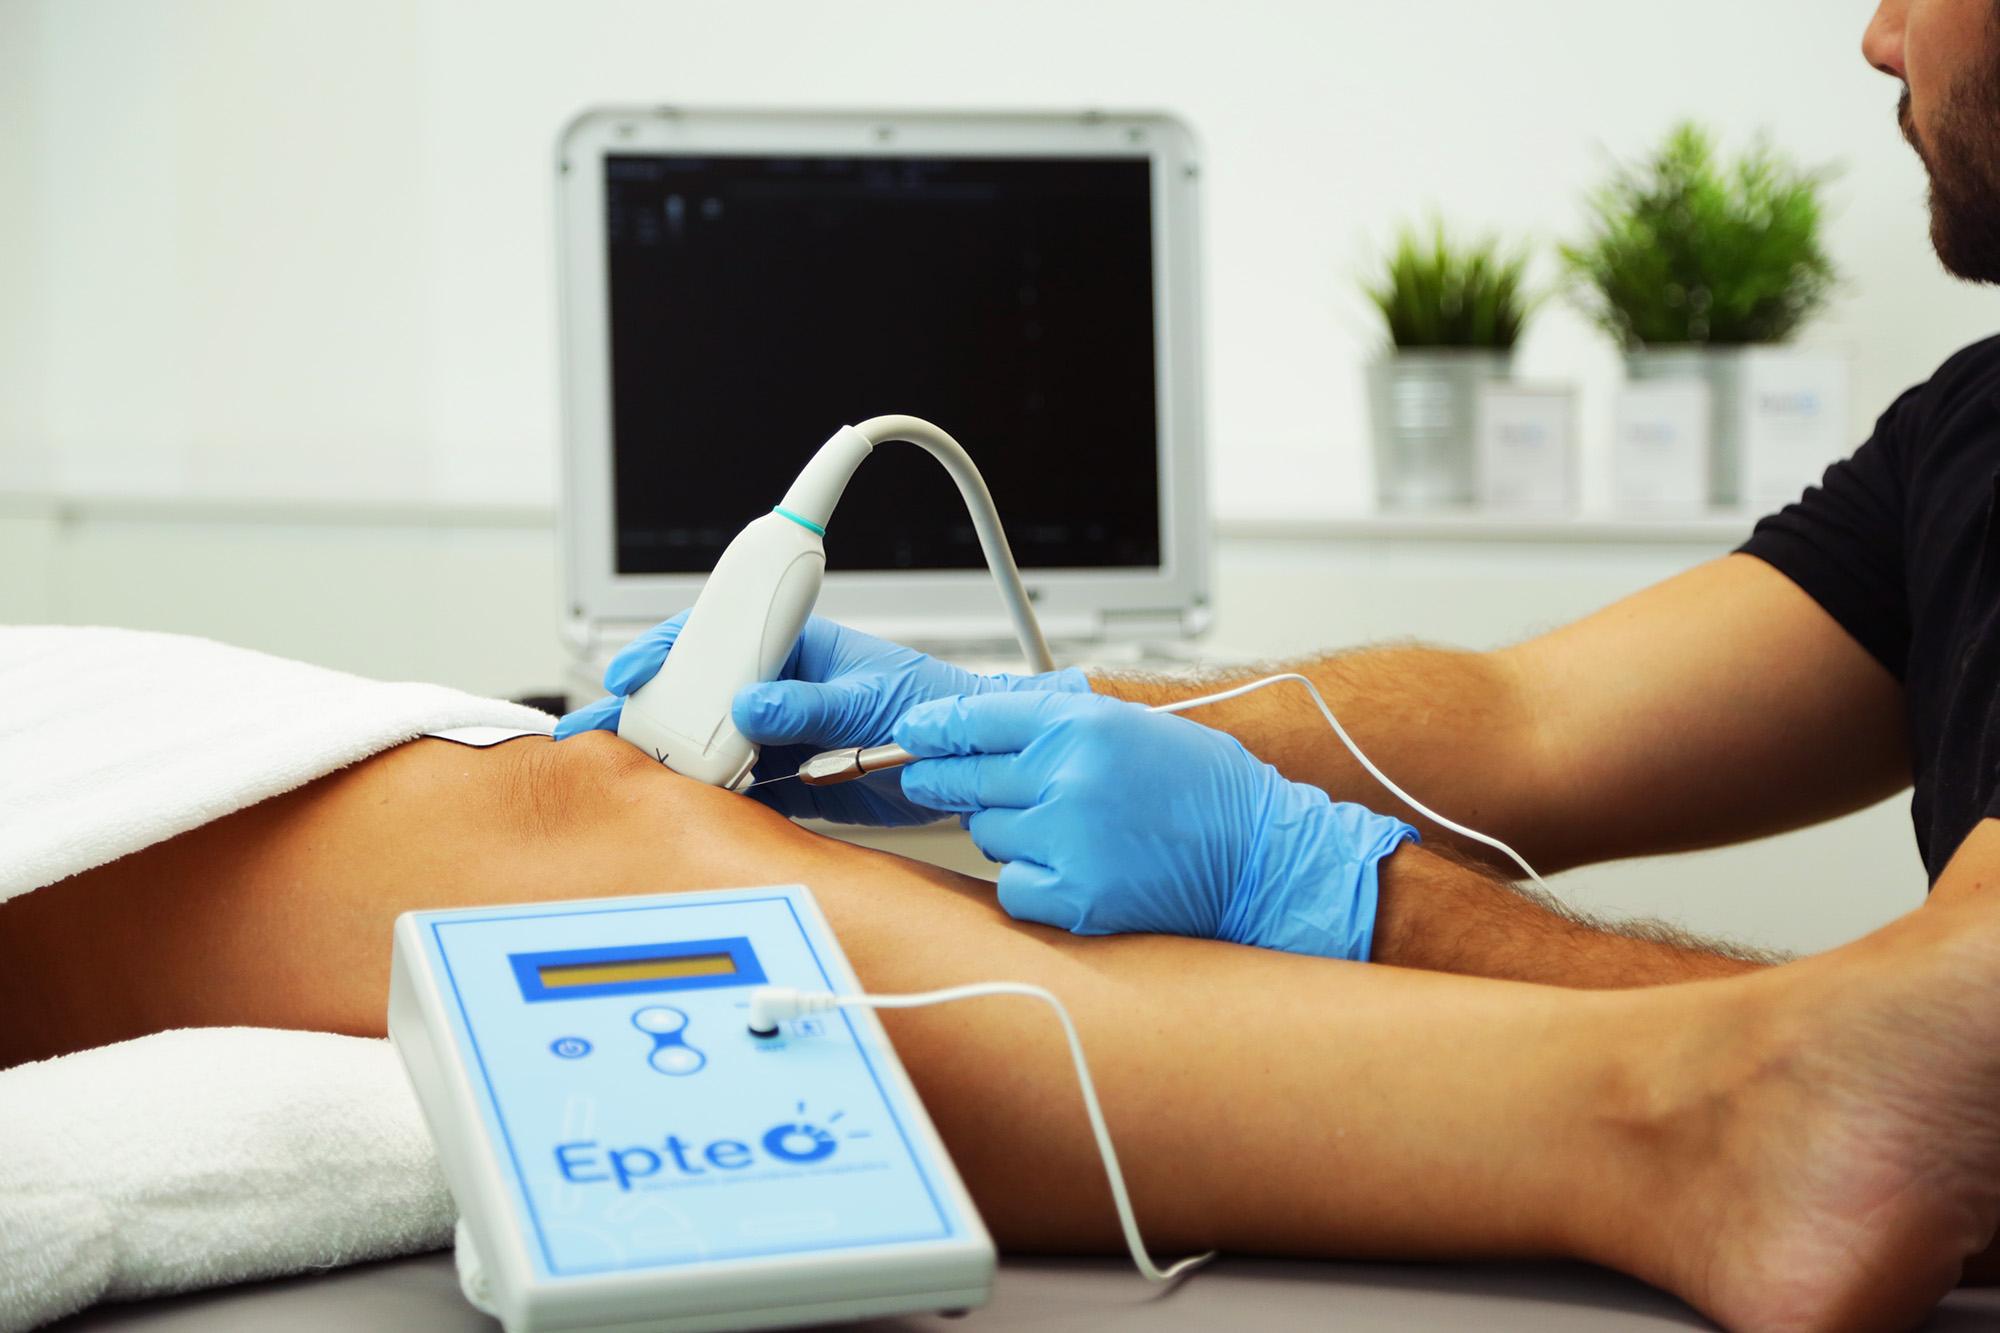 Servicio electrolisis percutanea terapeutica en clinica ionclinics